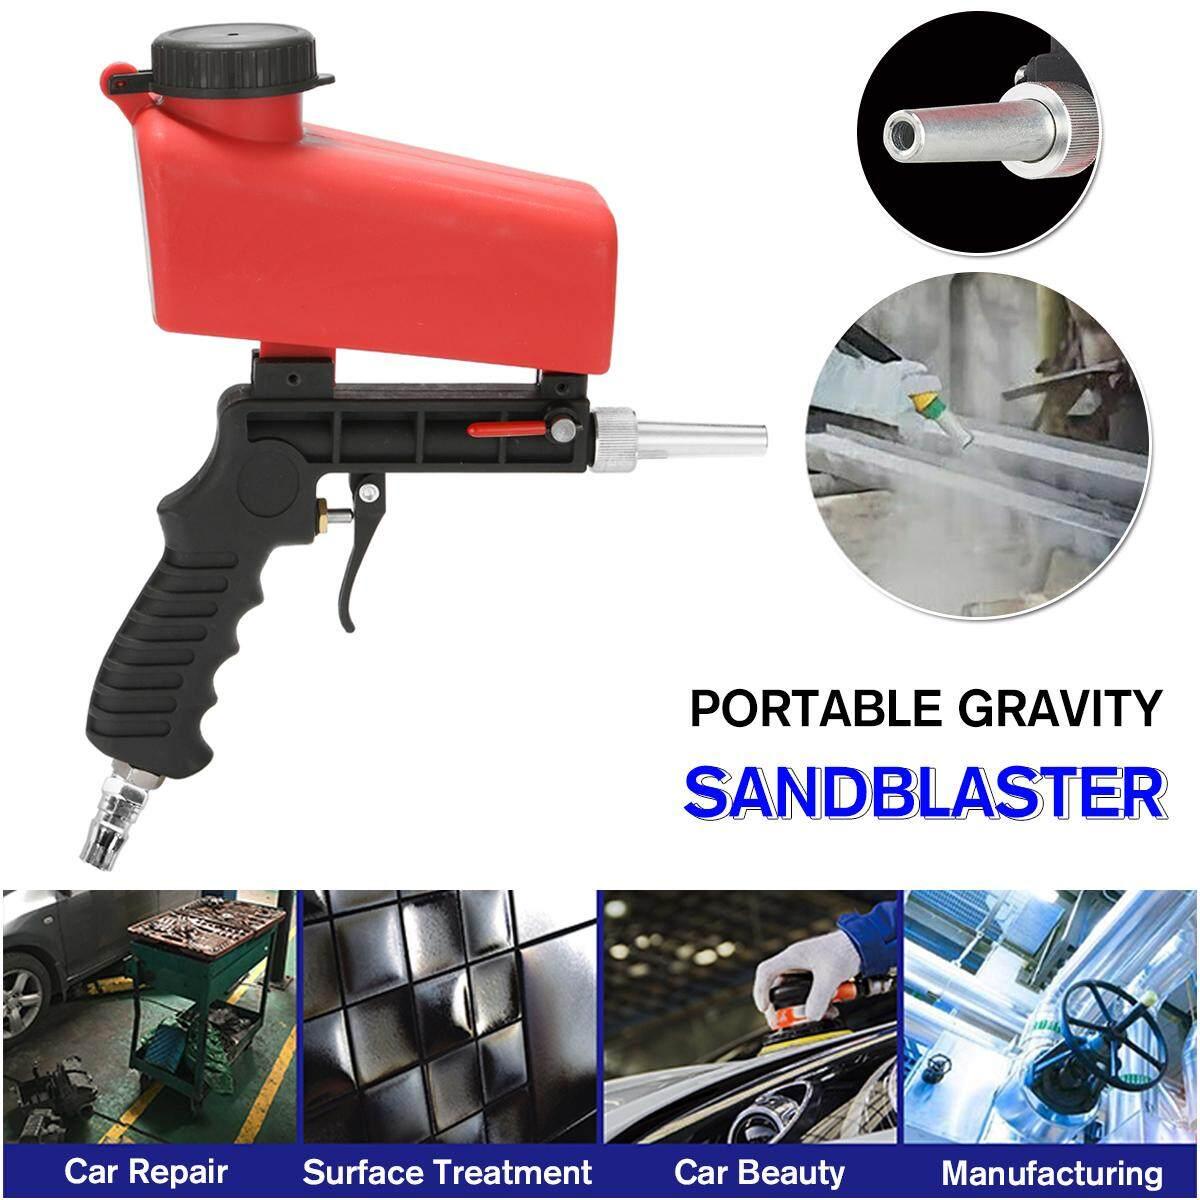 Ergonomic Portable Gra vity Pneumatic Sandblaster Sandblasting Machine Removing Spot Rust